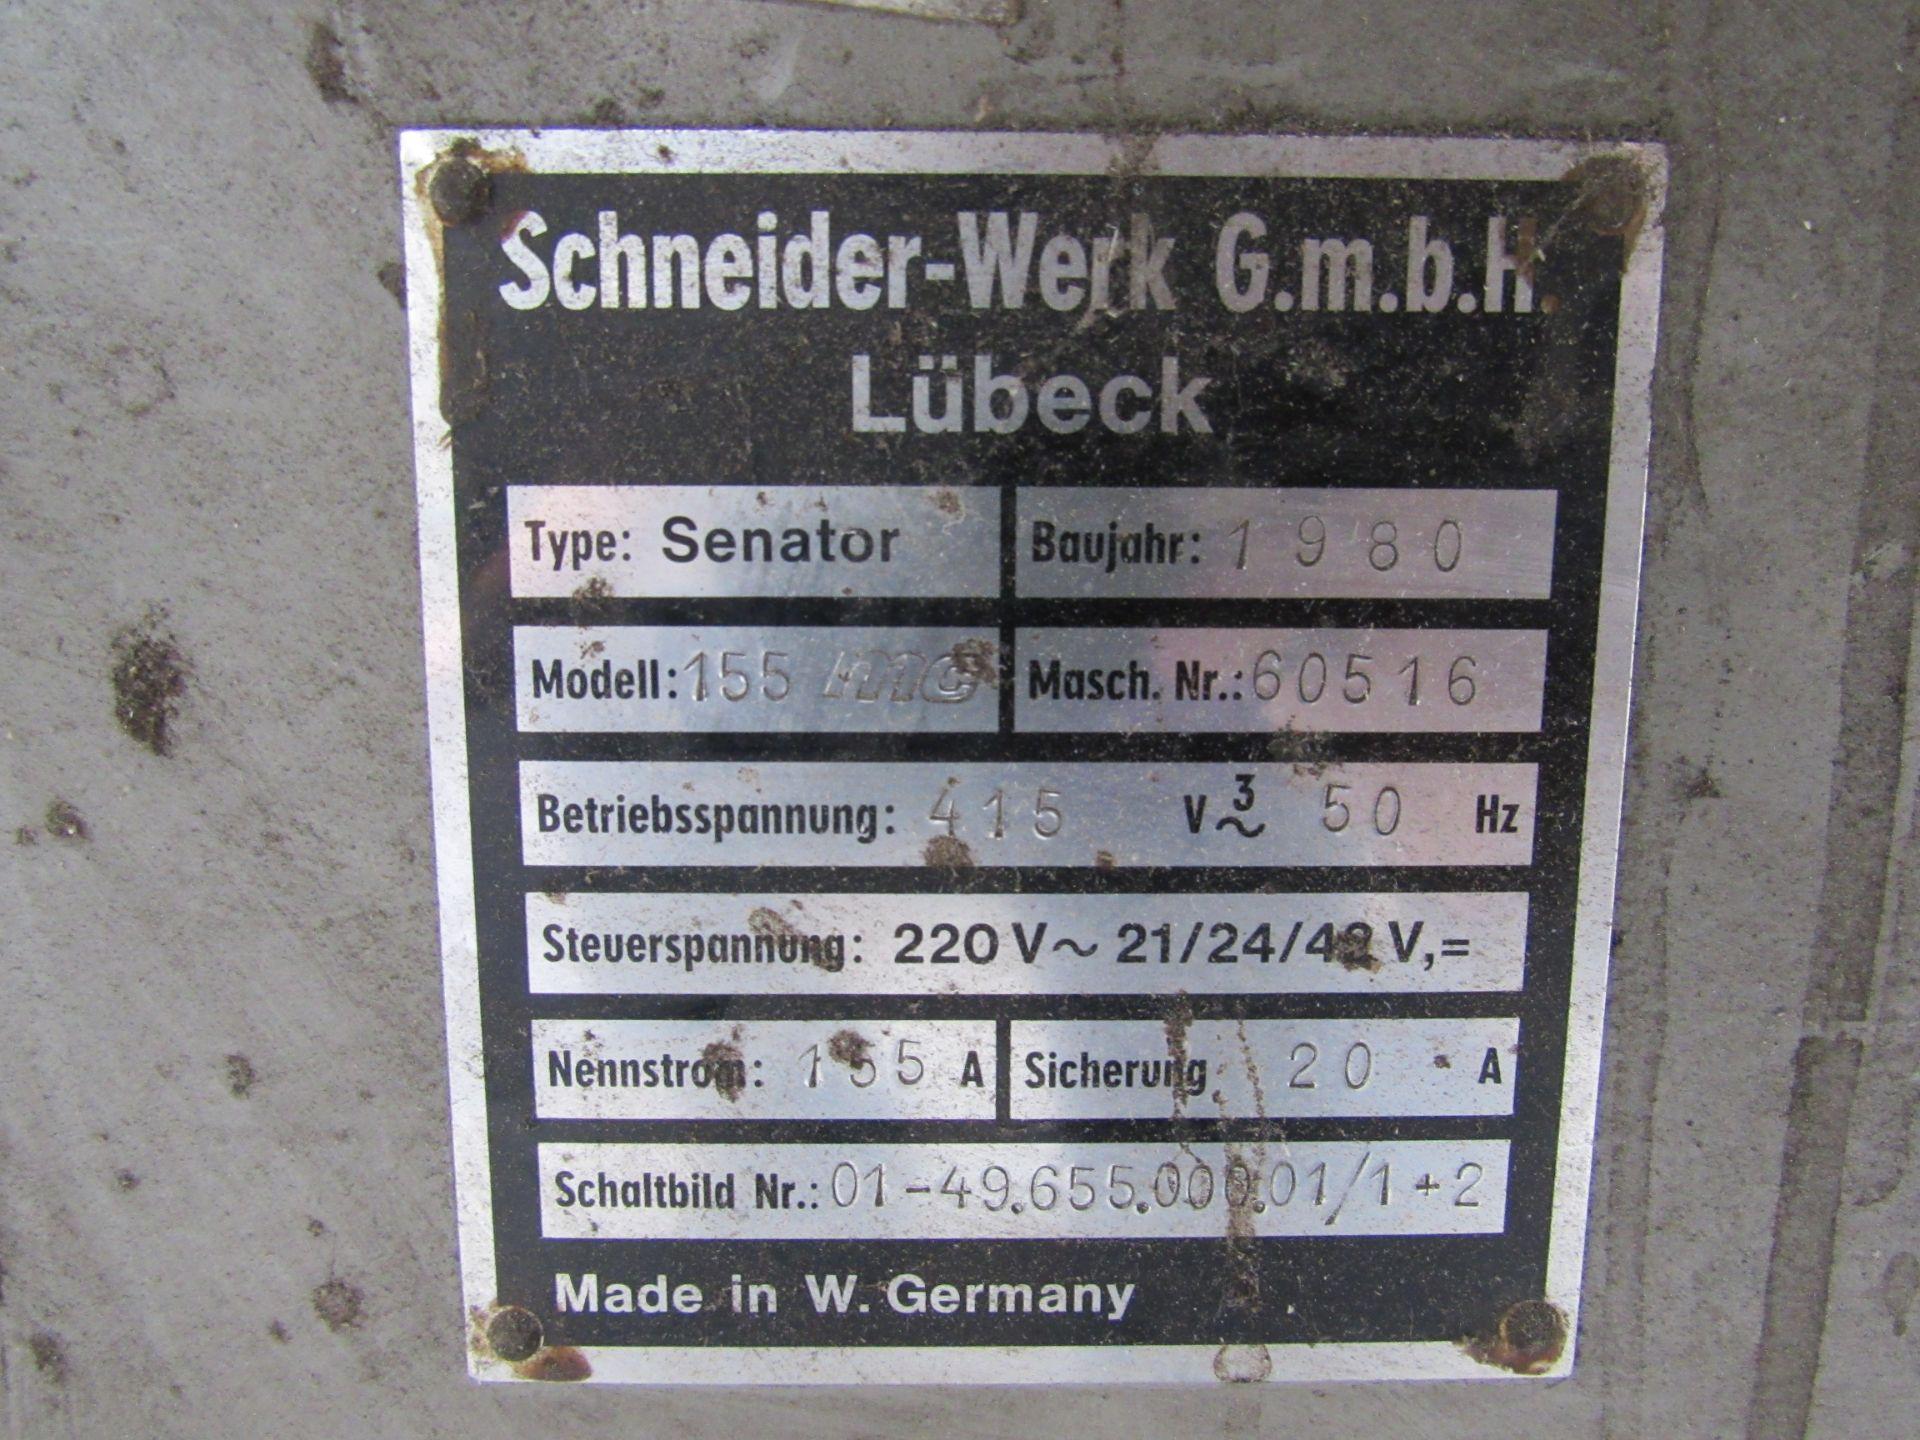 Schneider Senator MC155 guillotine 1980, Serial Number 60516 - Image 5 of 6